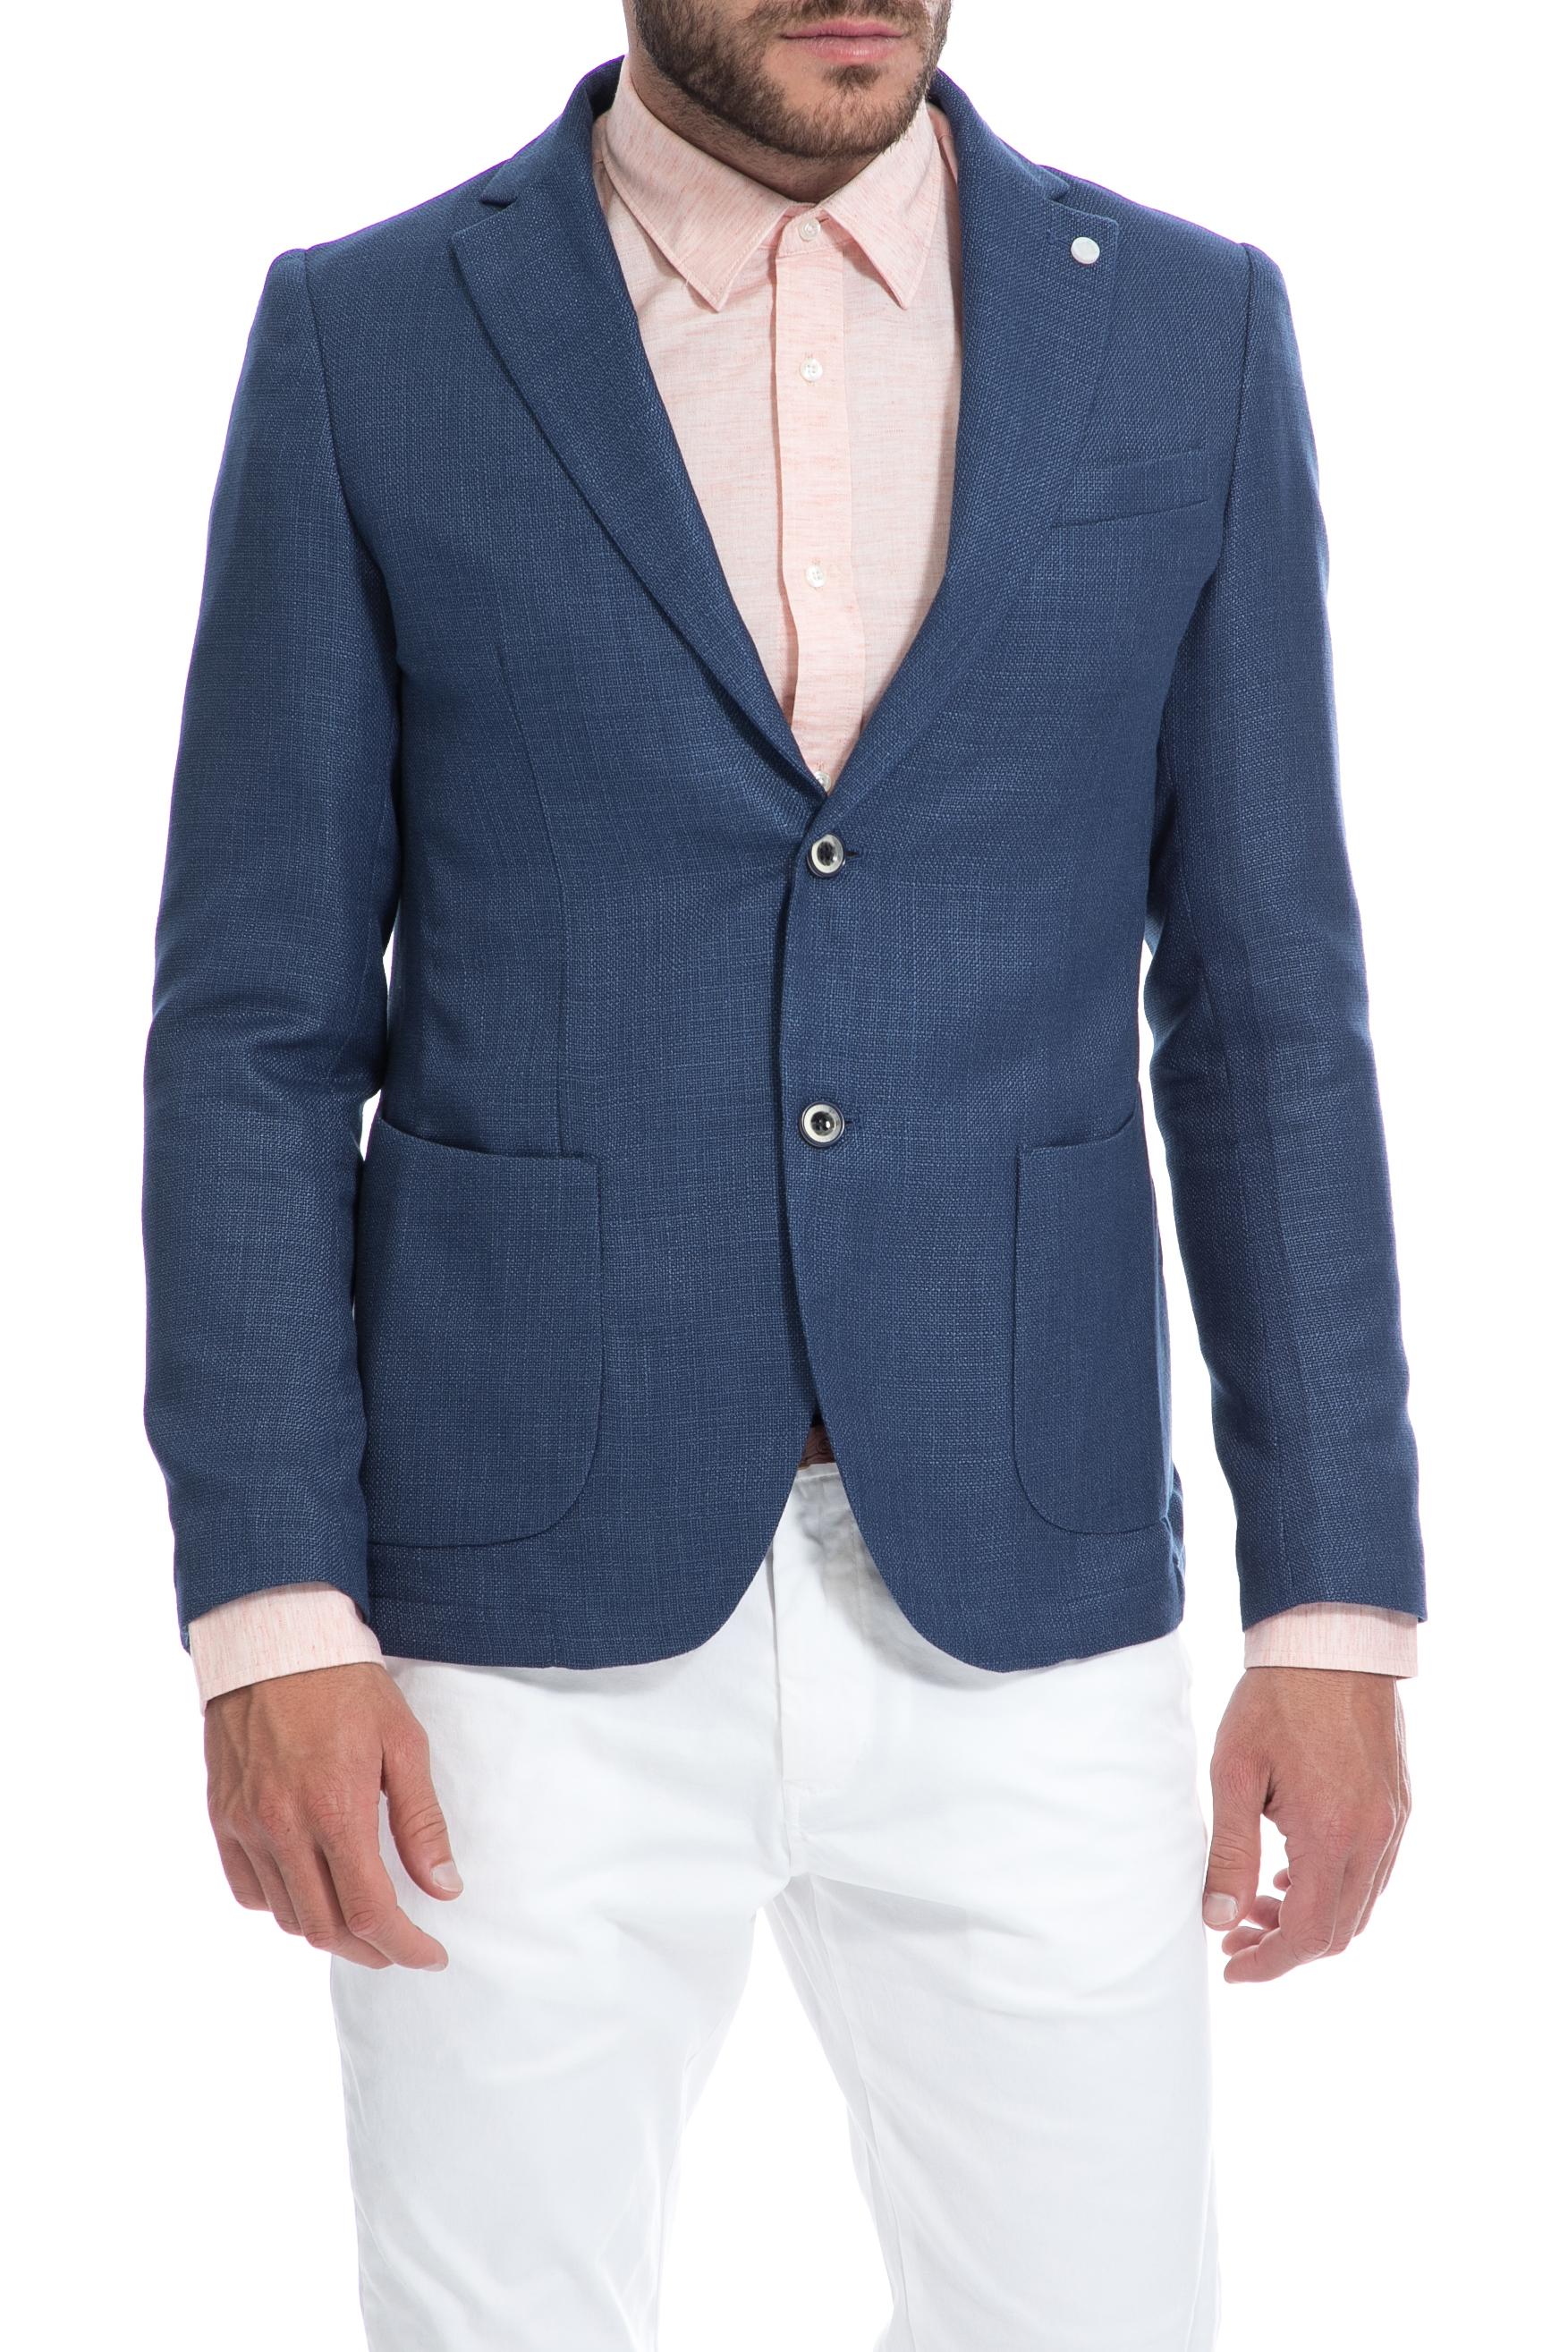 SSEINSE – Ανδρικό σακάκι SSEINSE μπλε